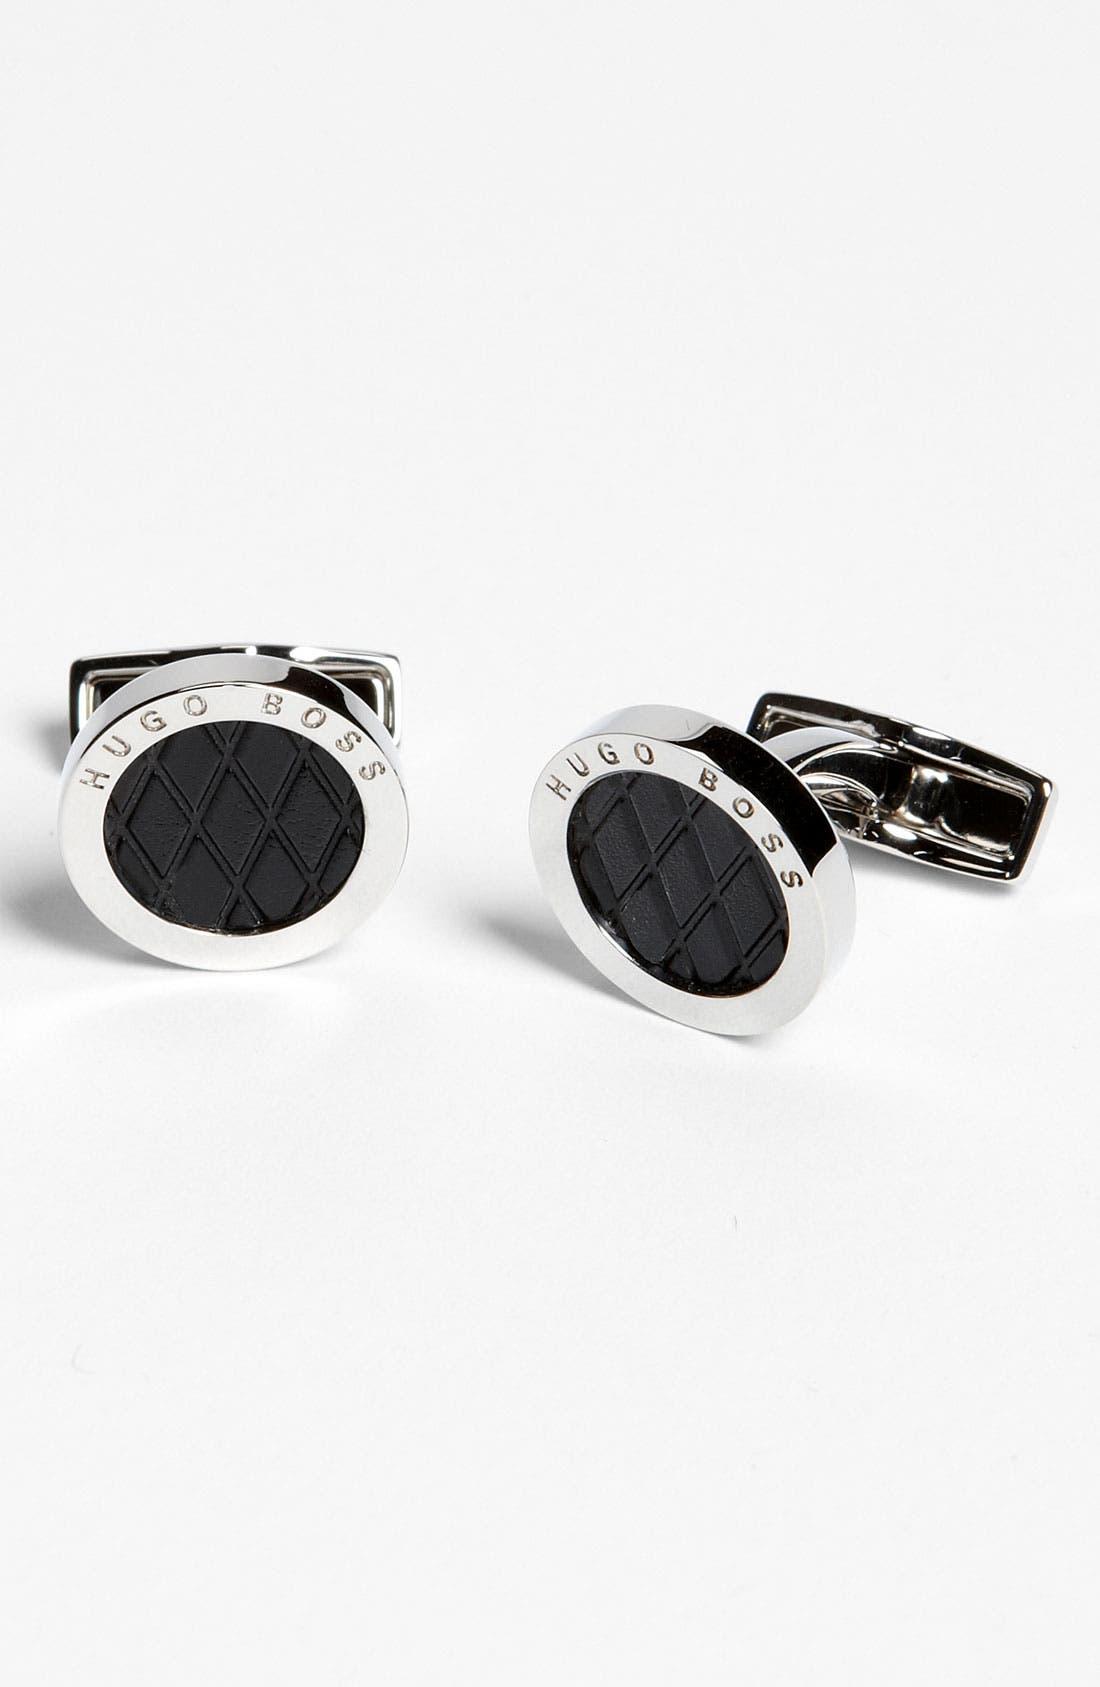 Main Image - BOSS Black 'Lael' Cuff Links